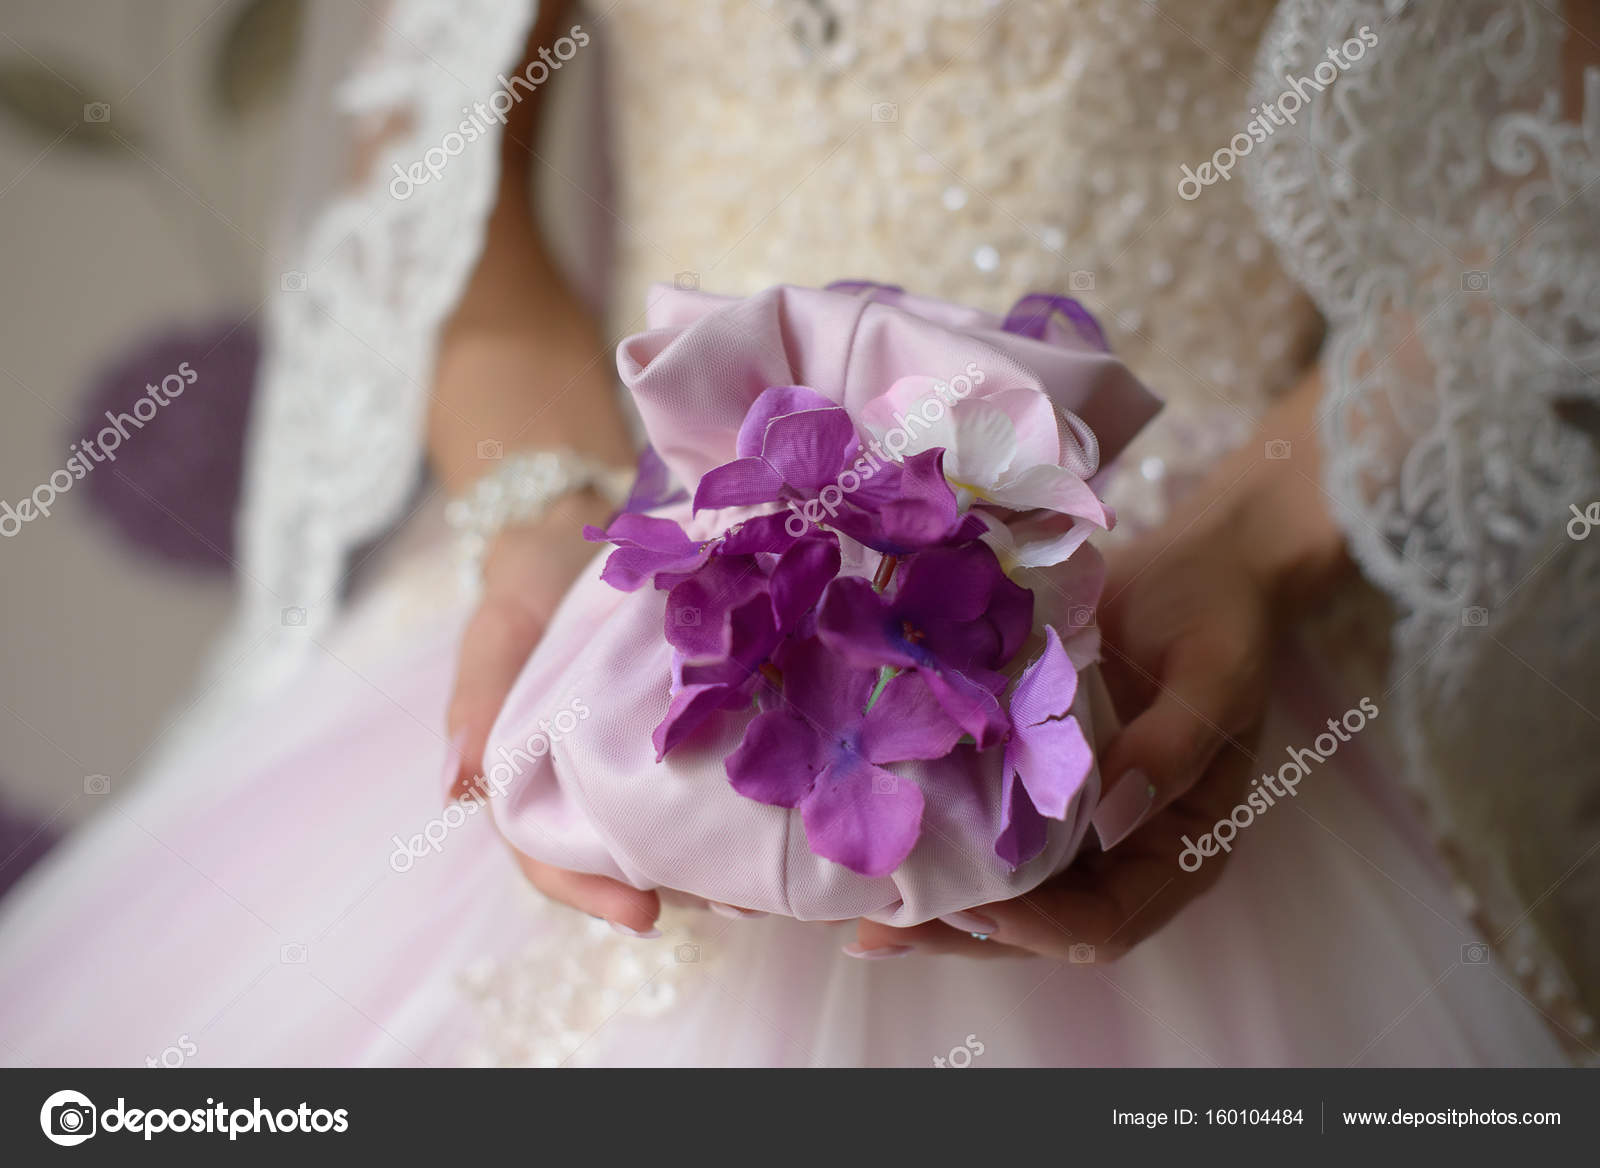 d4affa1d76 Νύφη ντυμένη με τούλι νυφικό